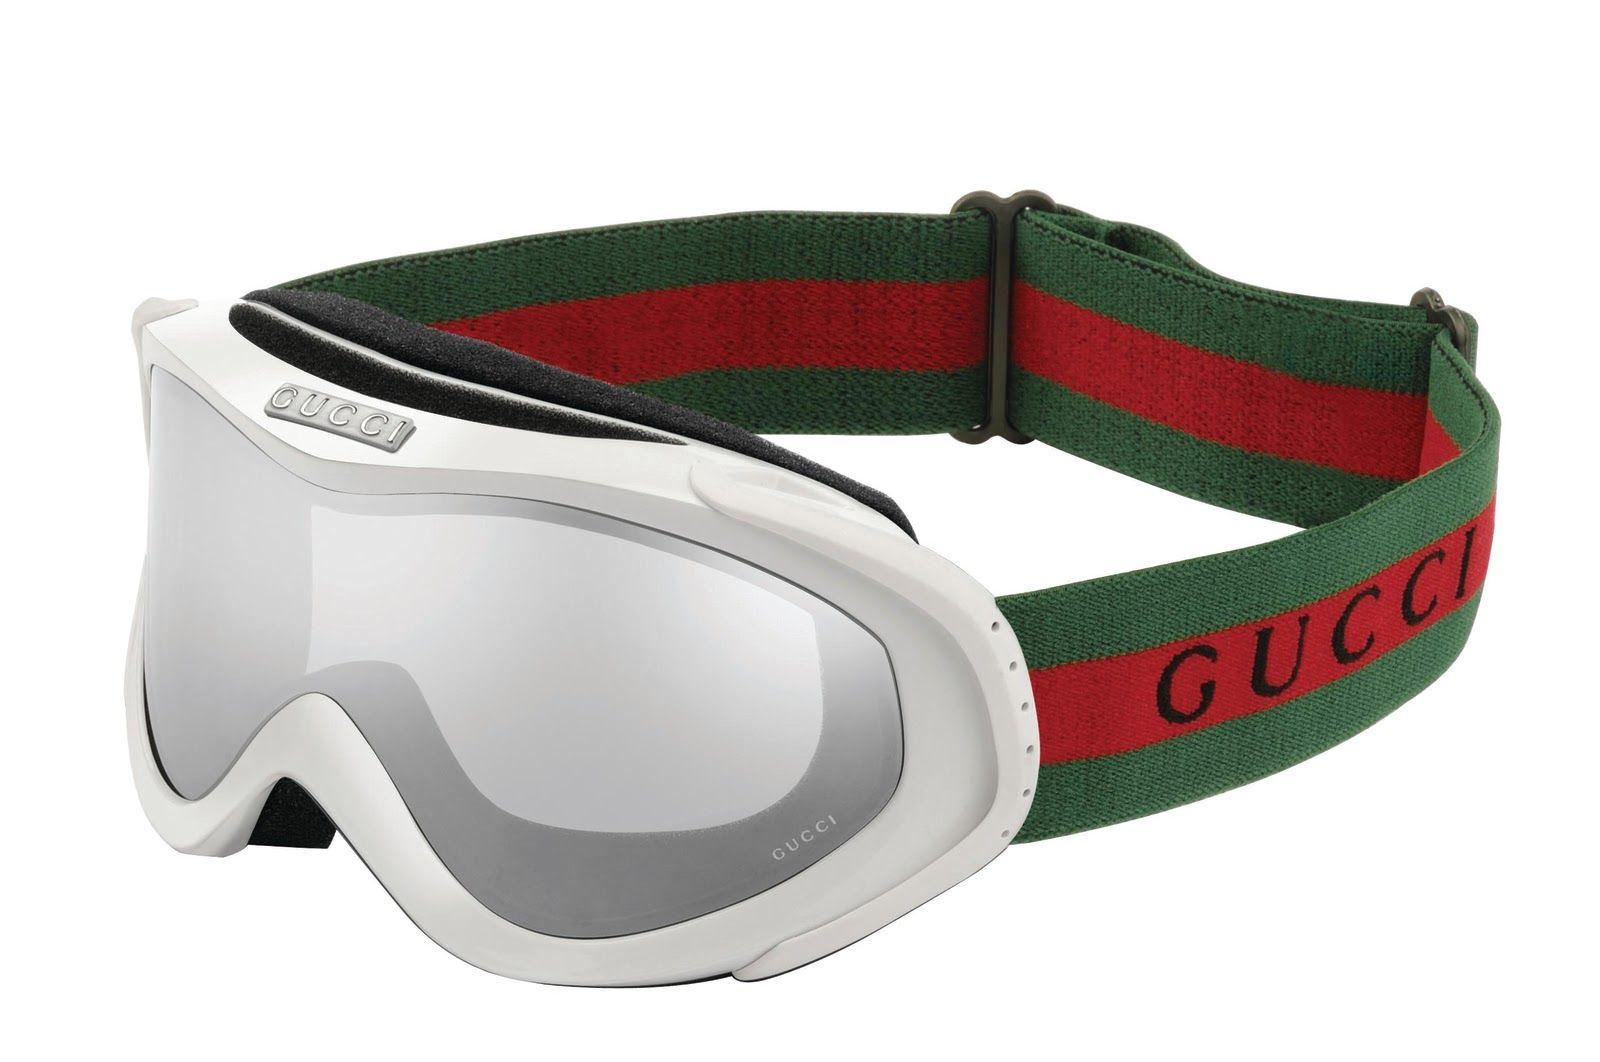 Gucci ski goggles in white   Inside my Closet in 2019   Gucci, Stuff ... e74ac9da05e6